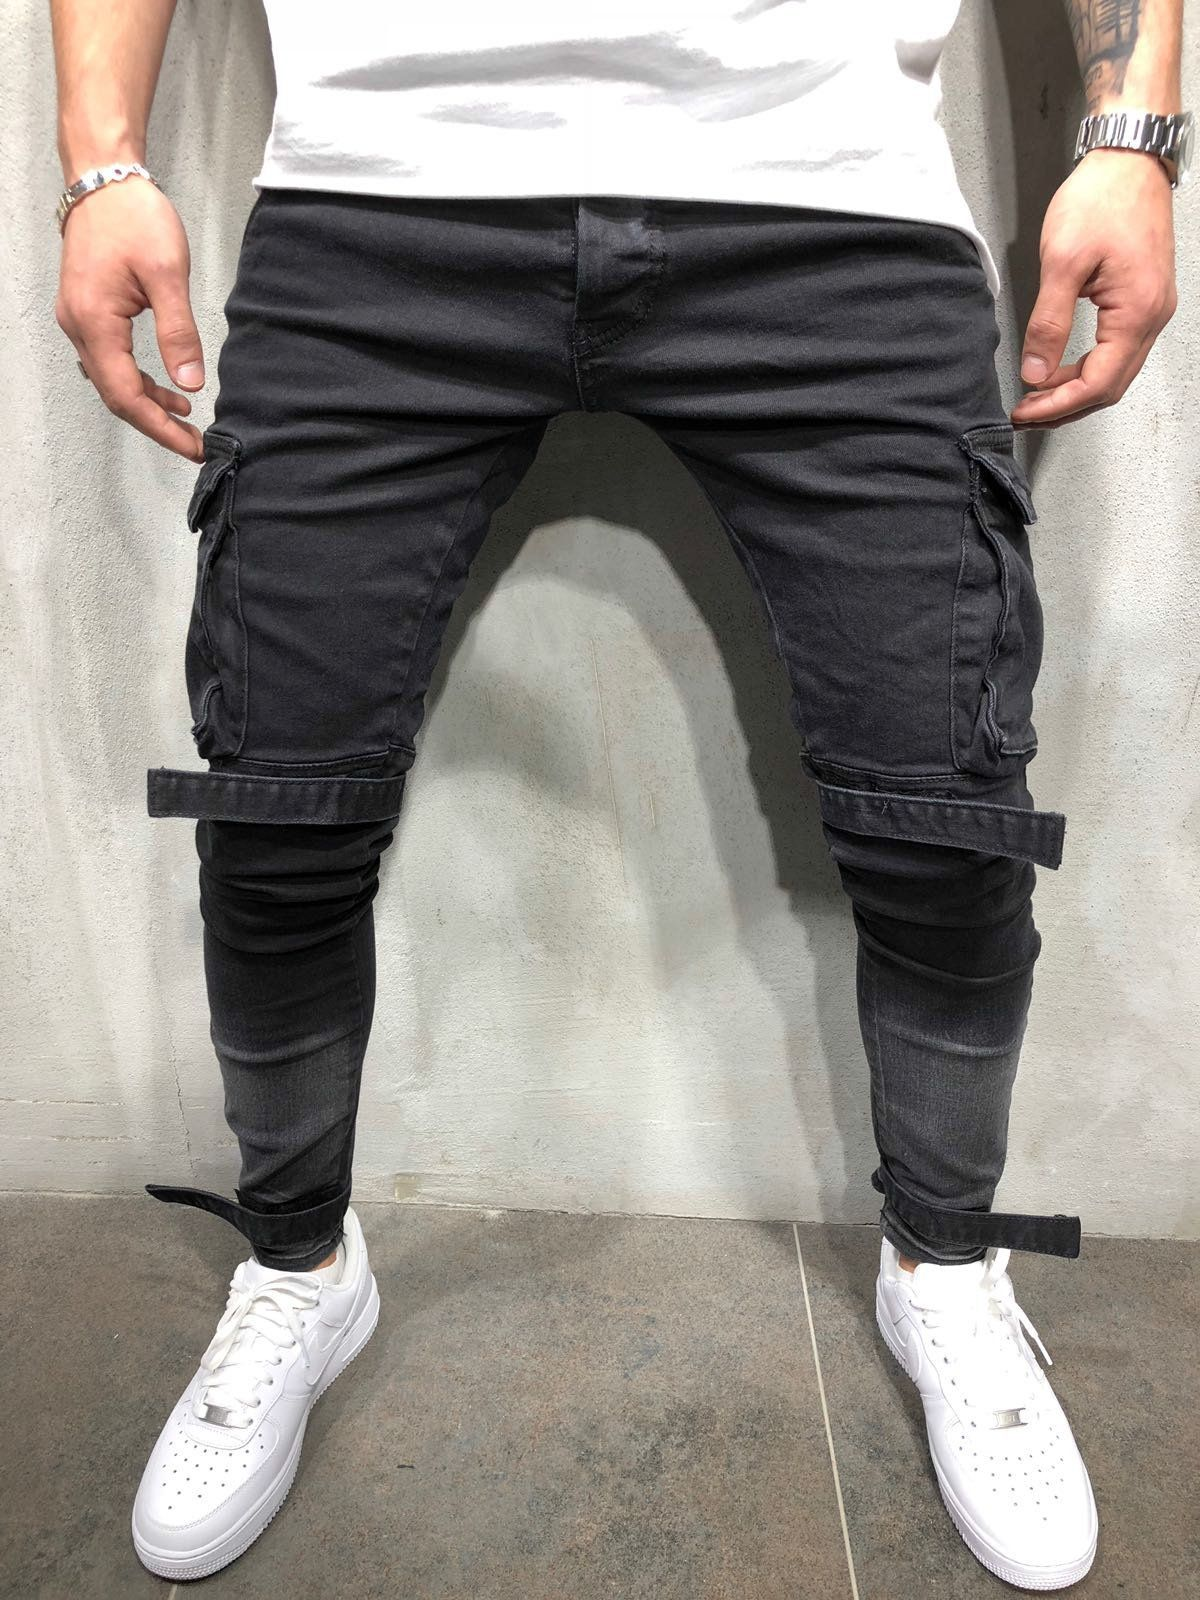 Fashion Slim Plain Packets Jeans Pants Kingboco Mens Fashion Edgy Hipster Mens Fashion Casual Denim Pants